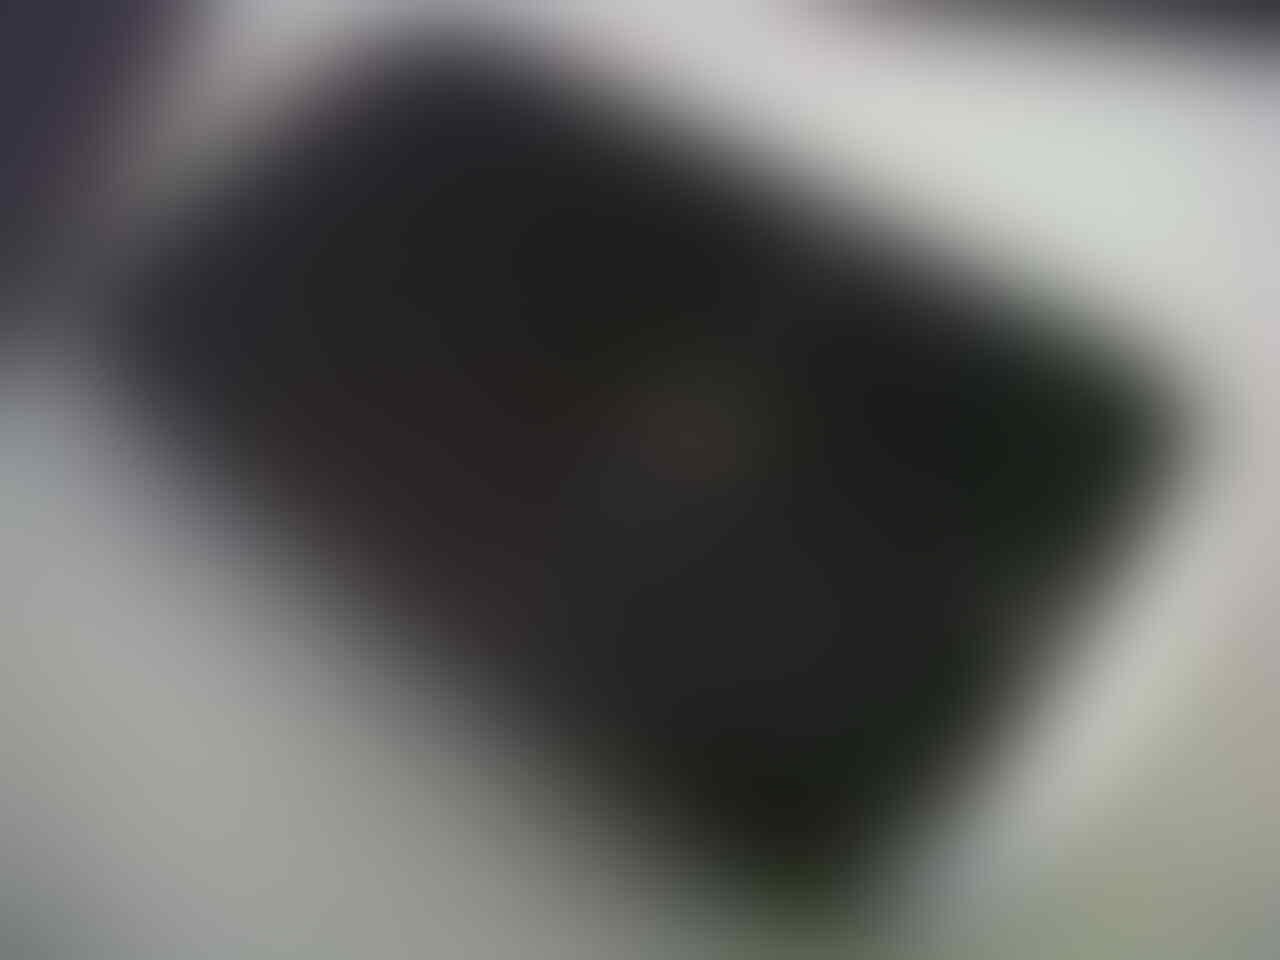 blackberry curve 9320 amstrong jogja